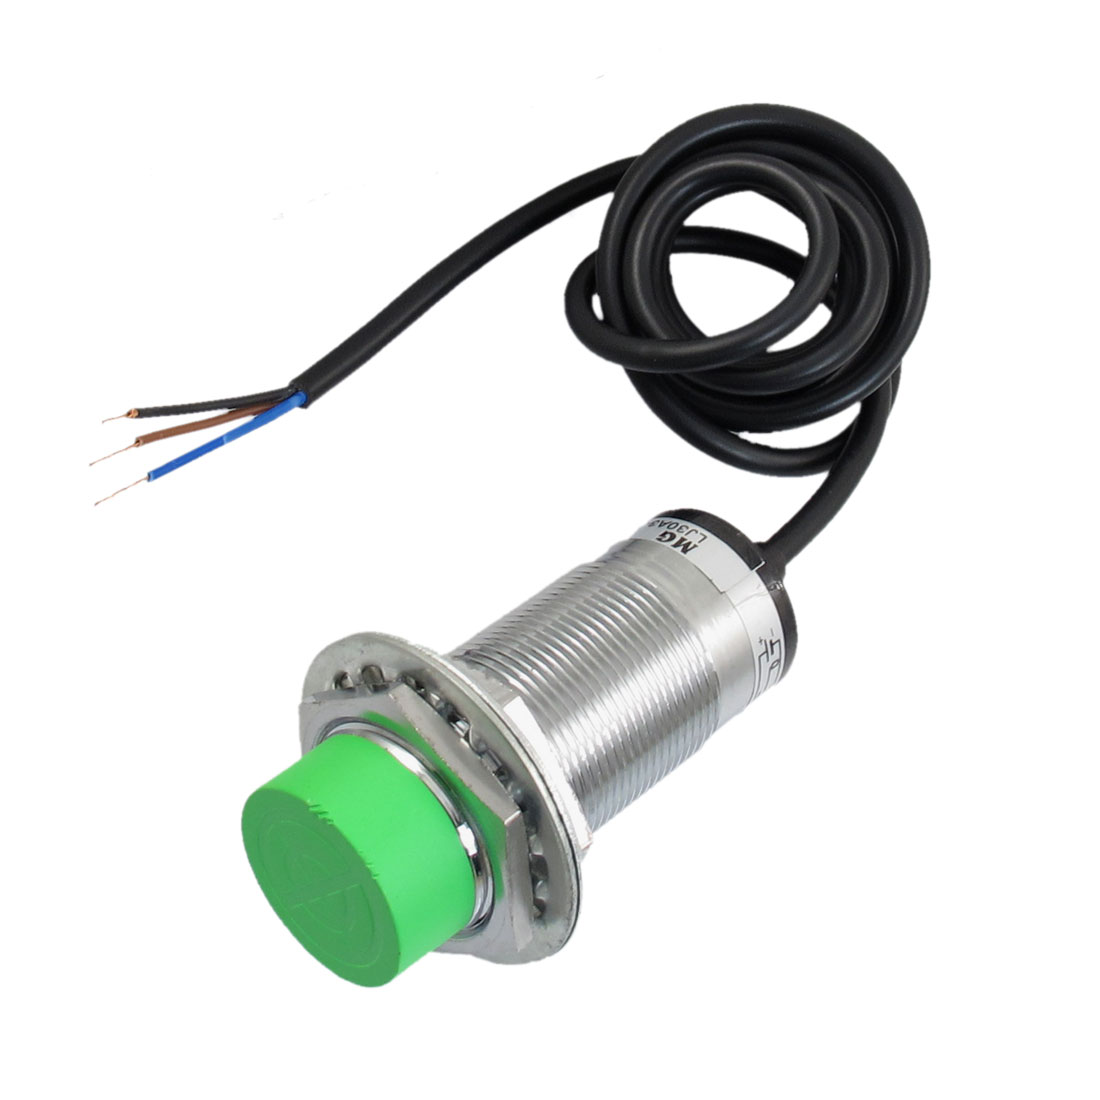 LJ30A3-15-Z/BY 6-36VDC 300mA 15mm Sensor PNP NO 3 Wires Proximity Switch